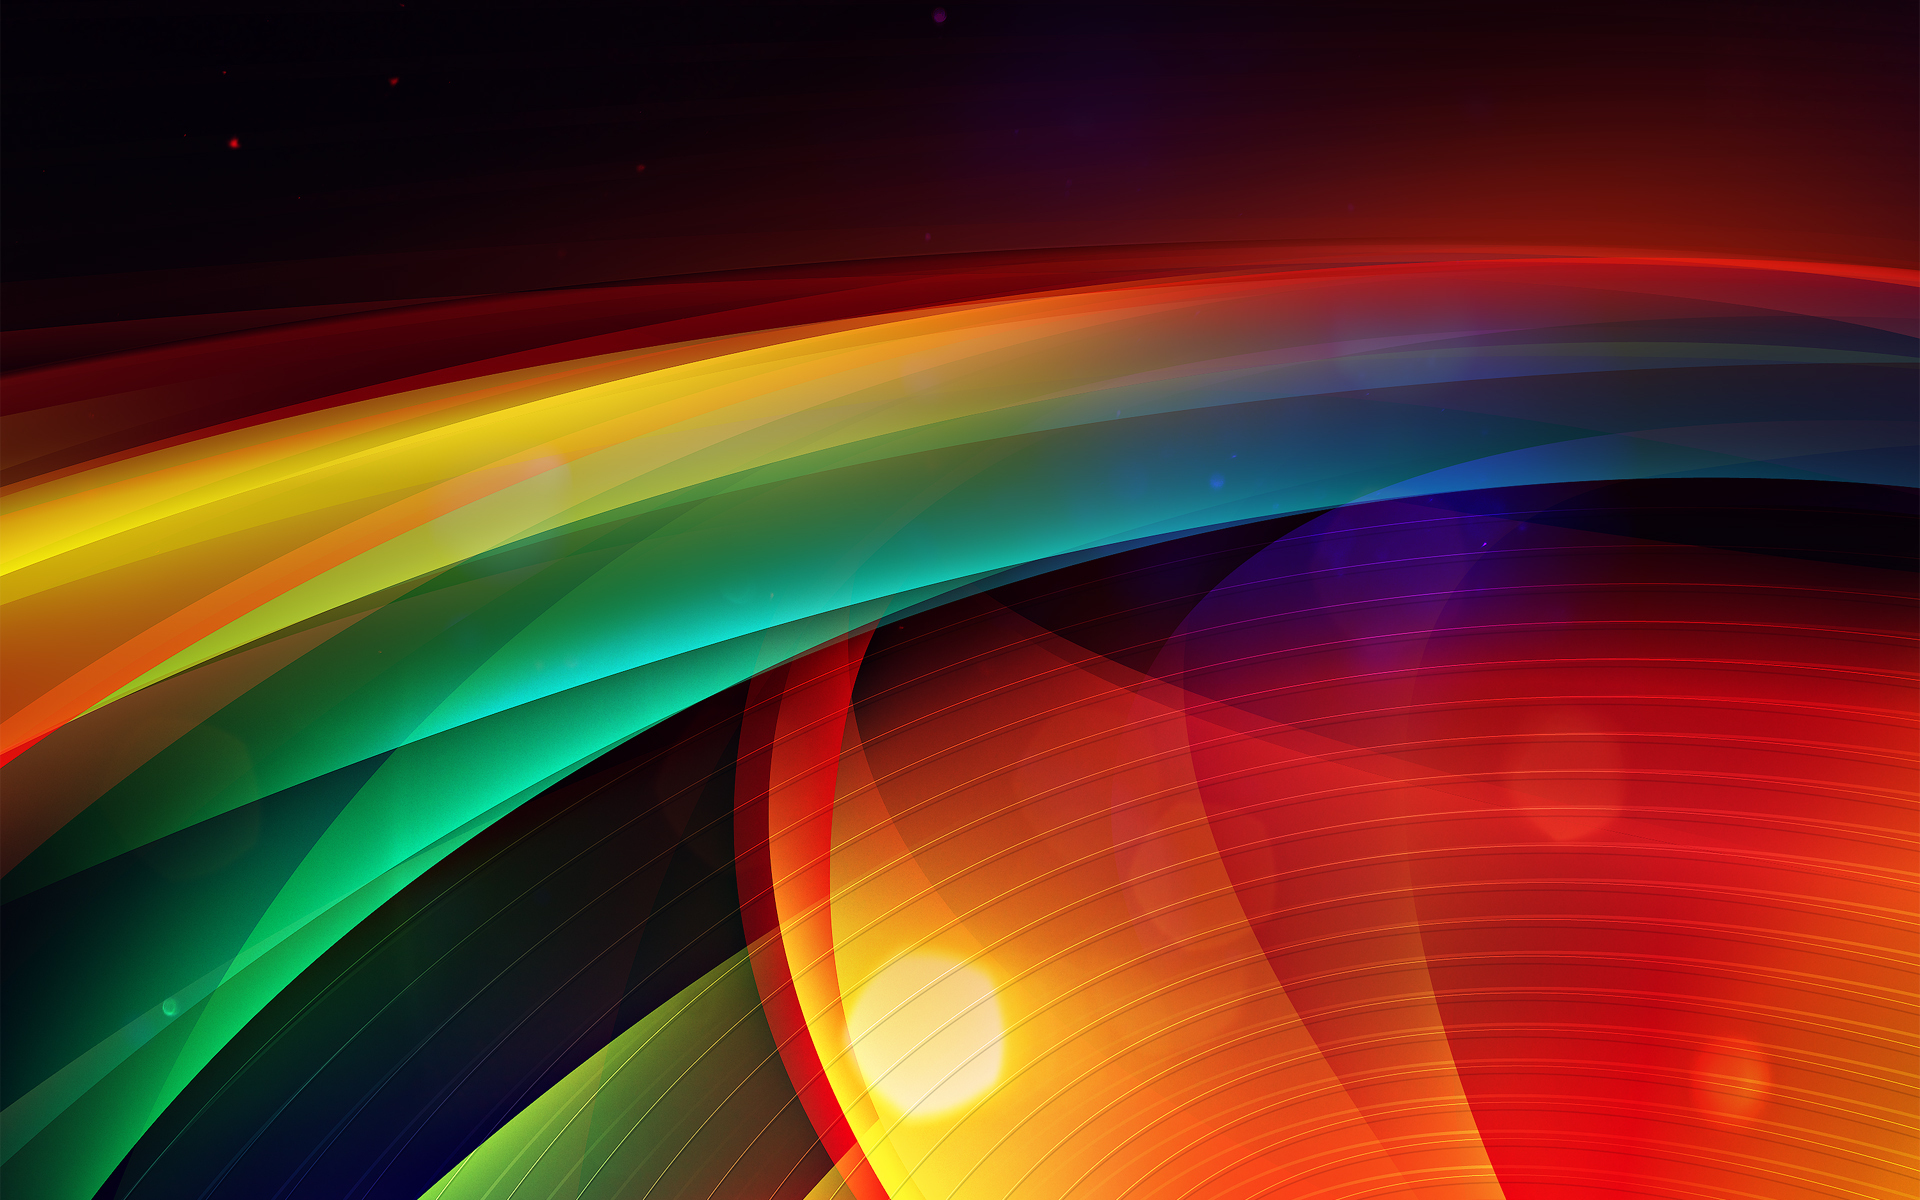 HD 1080p Wallpaper 1920x1200